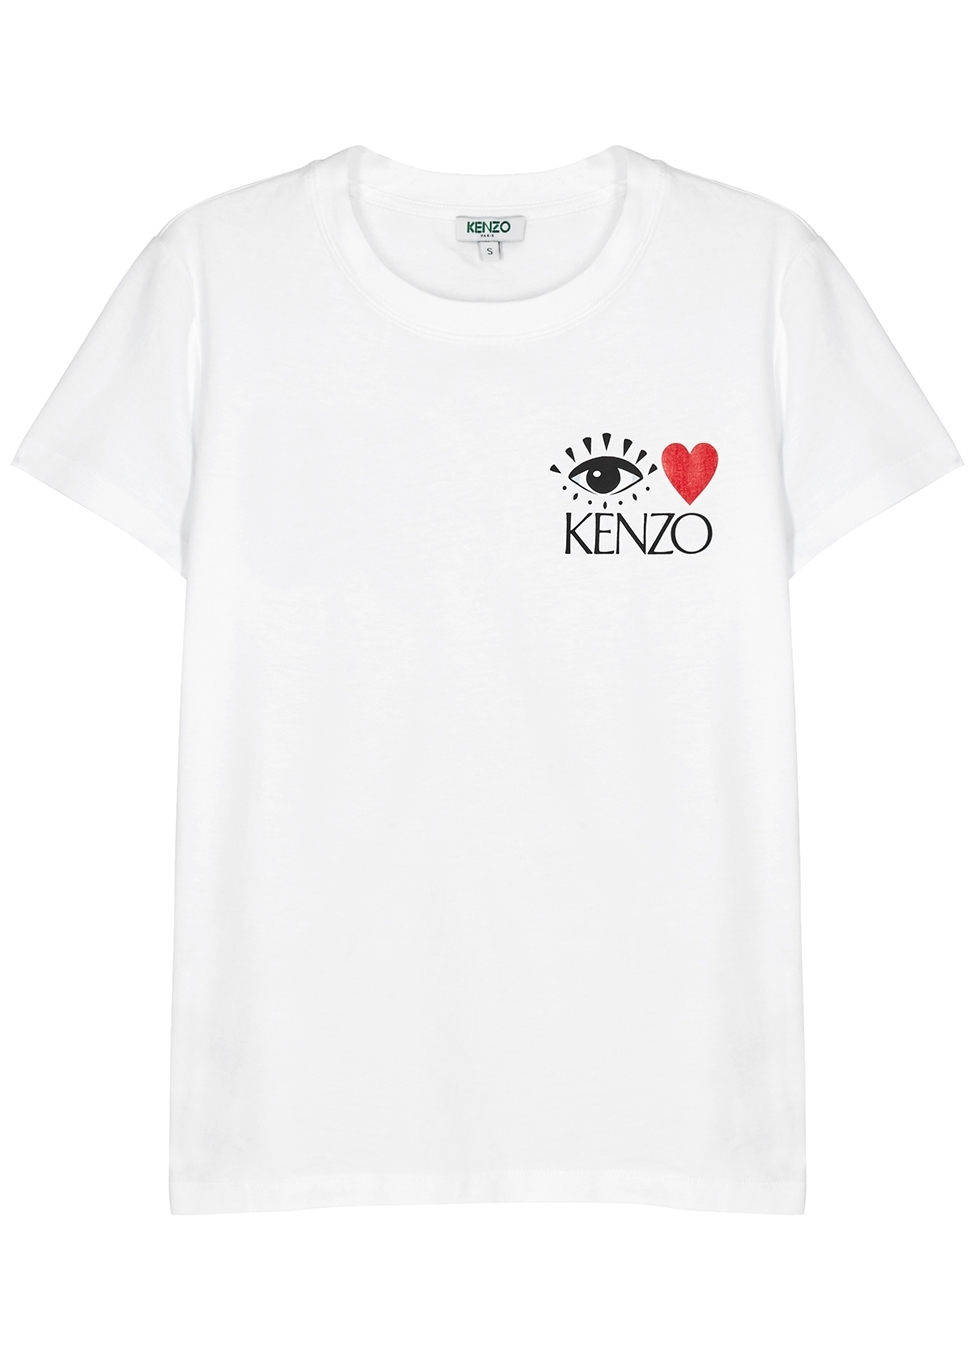 5a105f82f56 Kenzo - Harvey Nichols